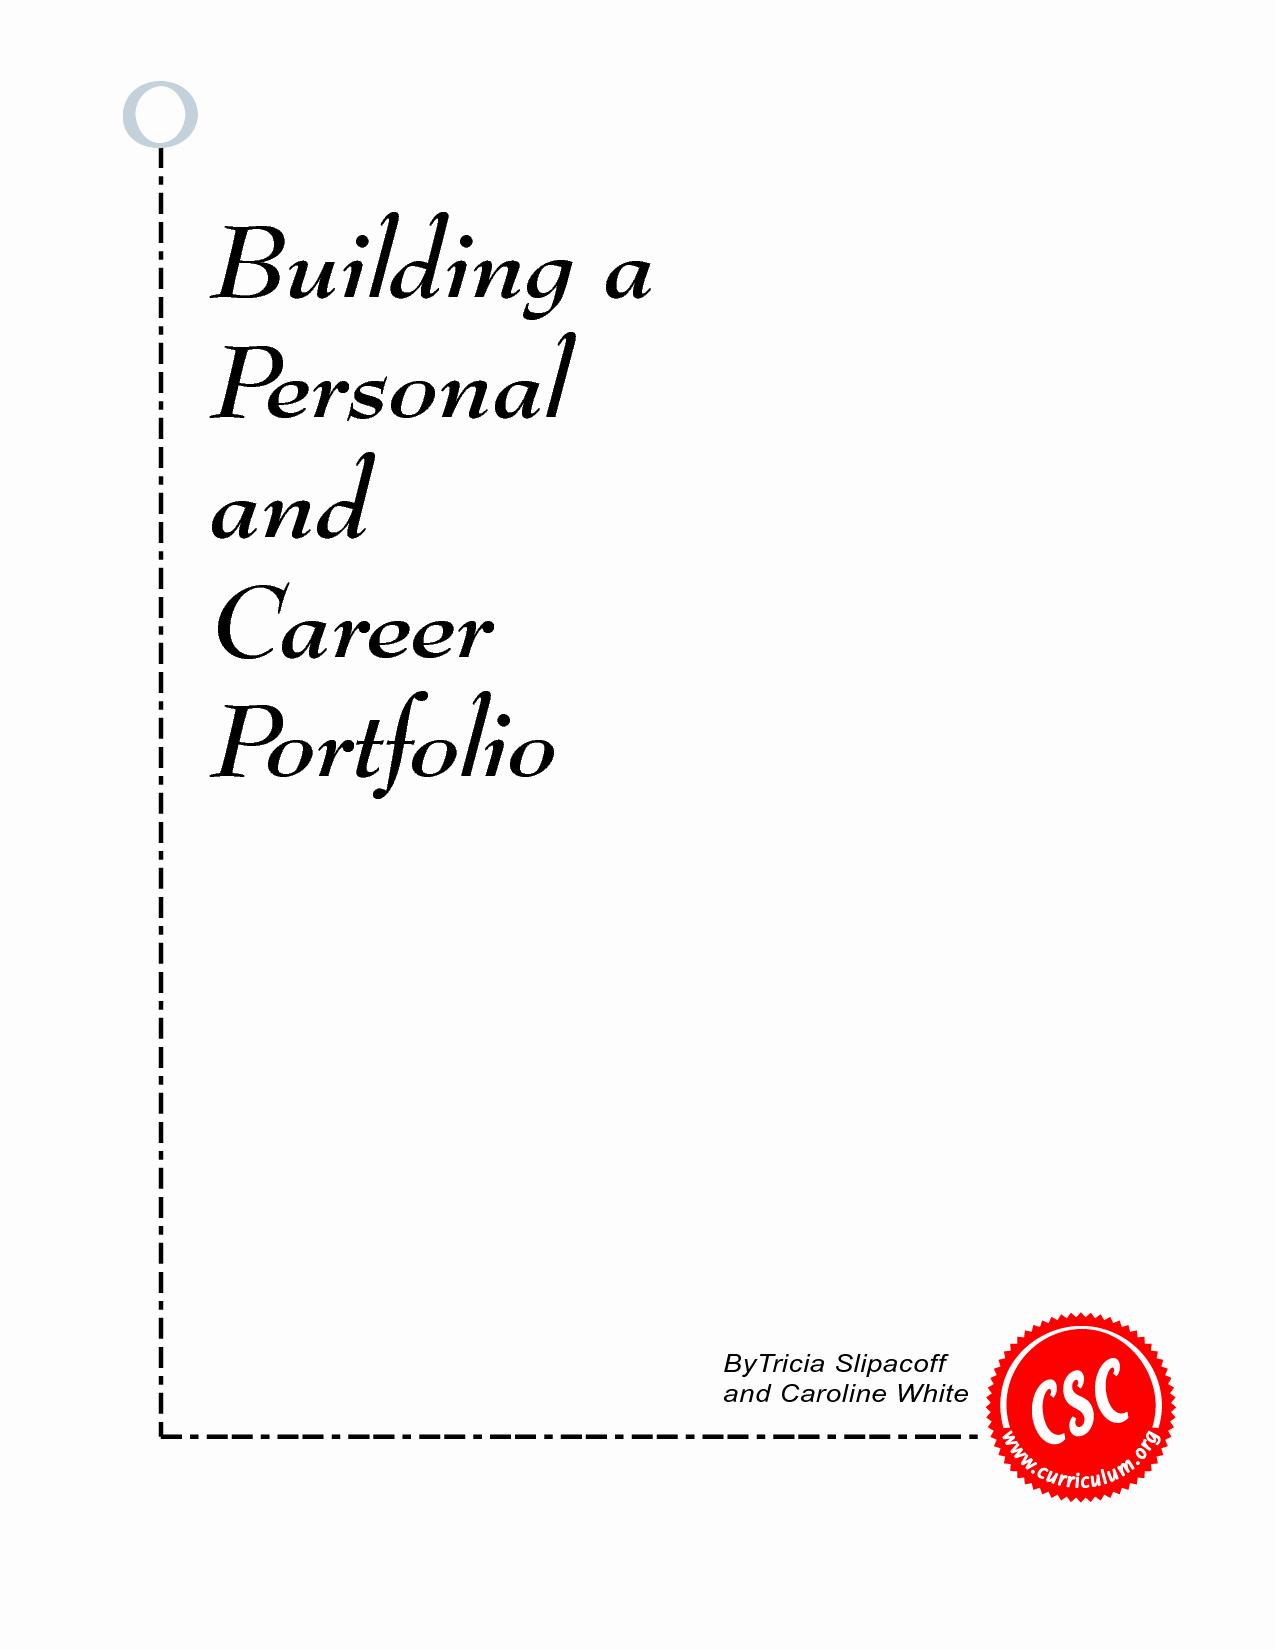 Portfolio Cover Page Template Fresh 10 Professional Portfolio Cover Page Template